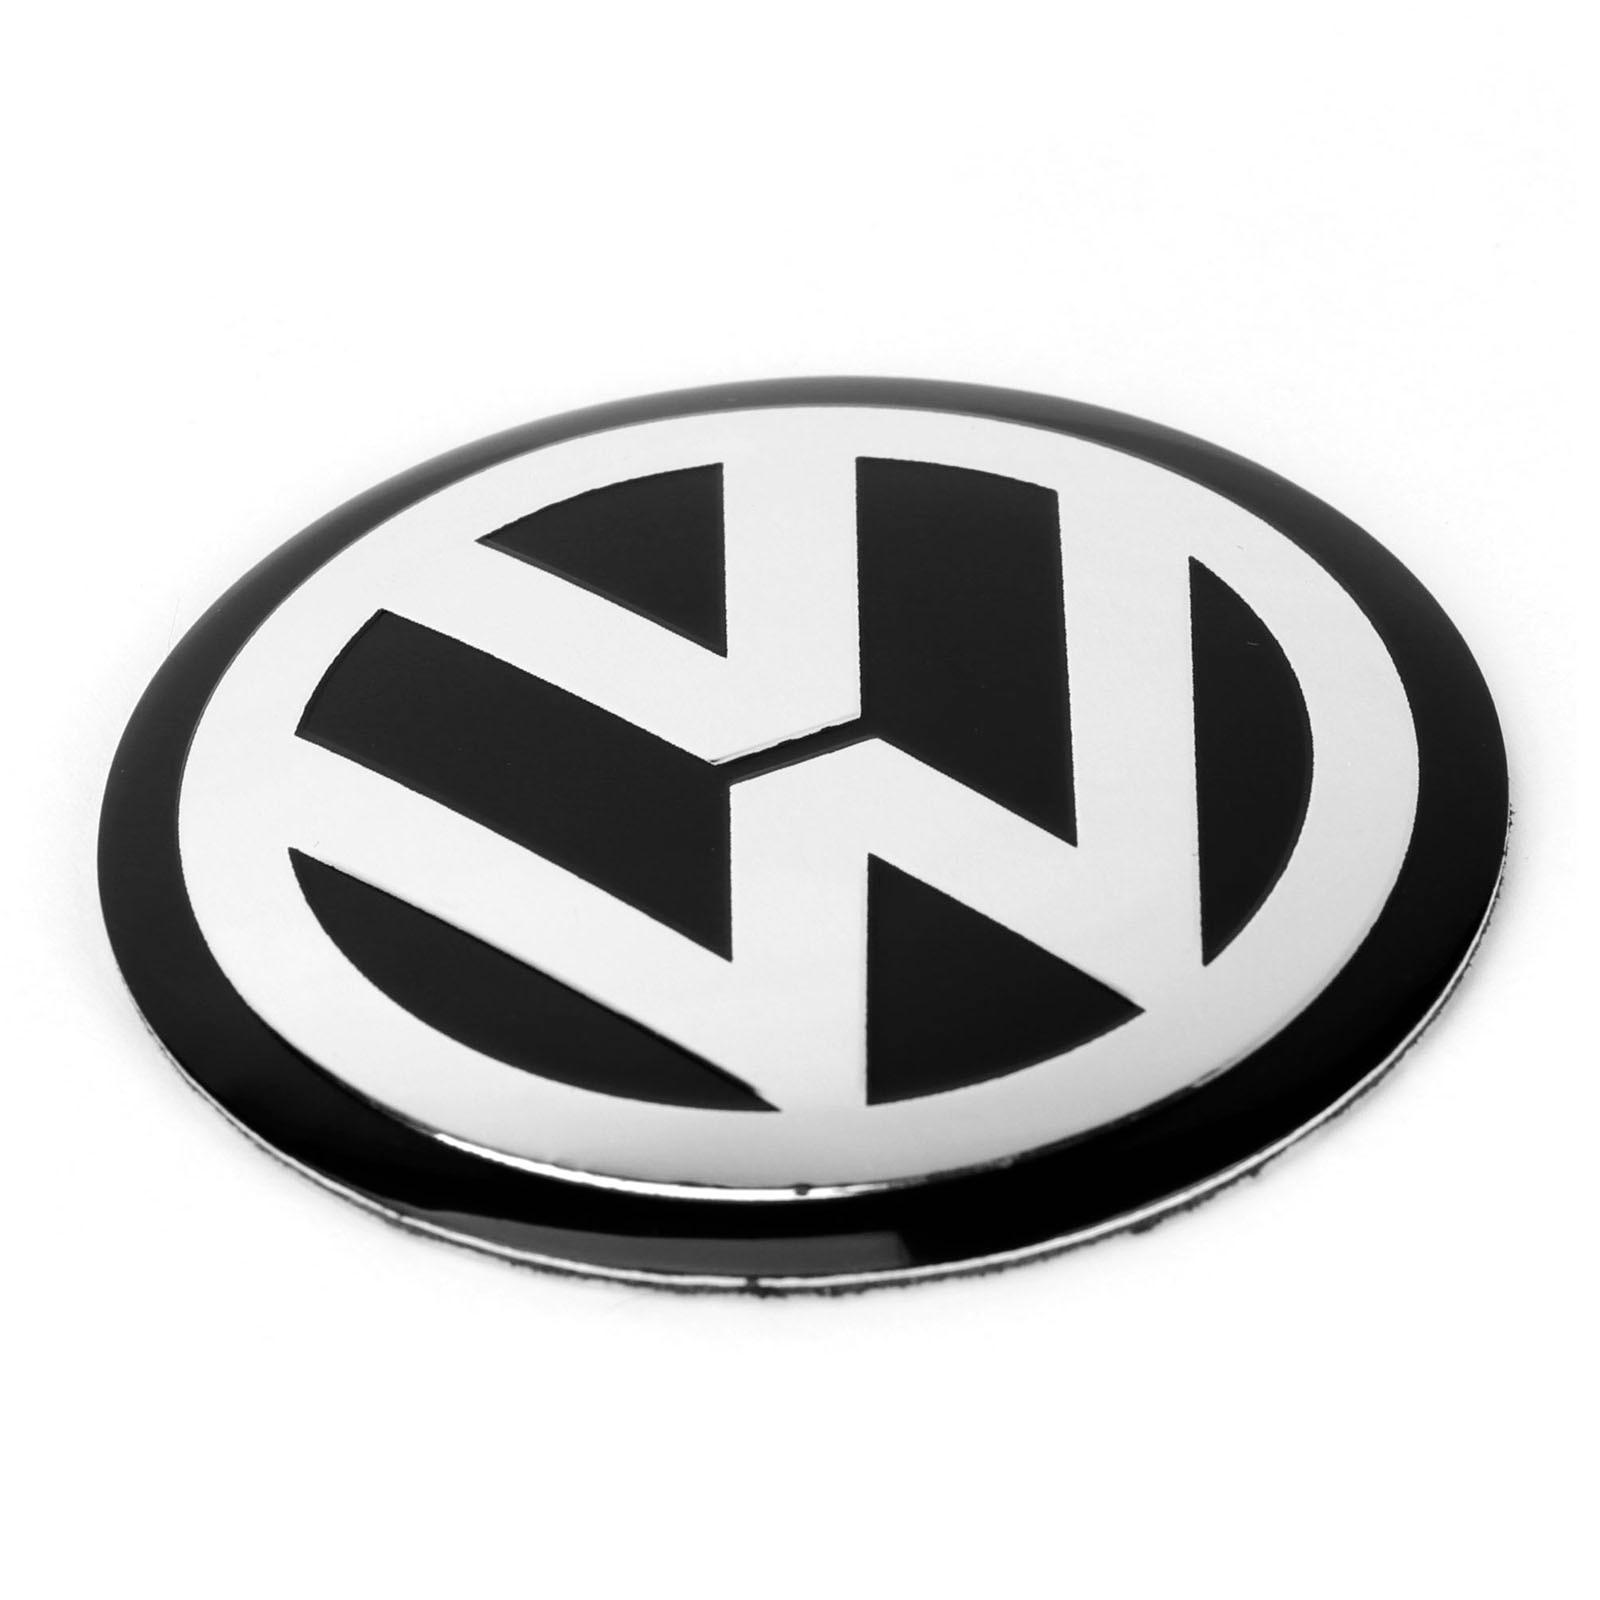 4pcs 56mm 60mm 65mm 75mm 90mm Black Car Wheel Center Hub Cap Badge Logo Emblem Decal Wheel Sticker Styling For VW 4